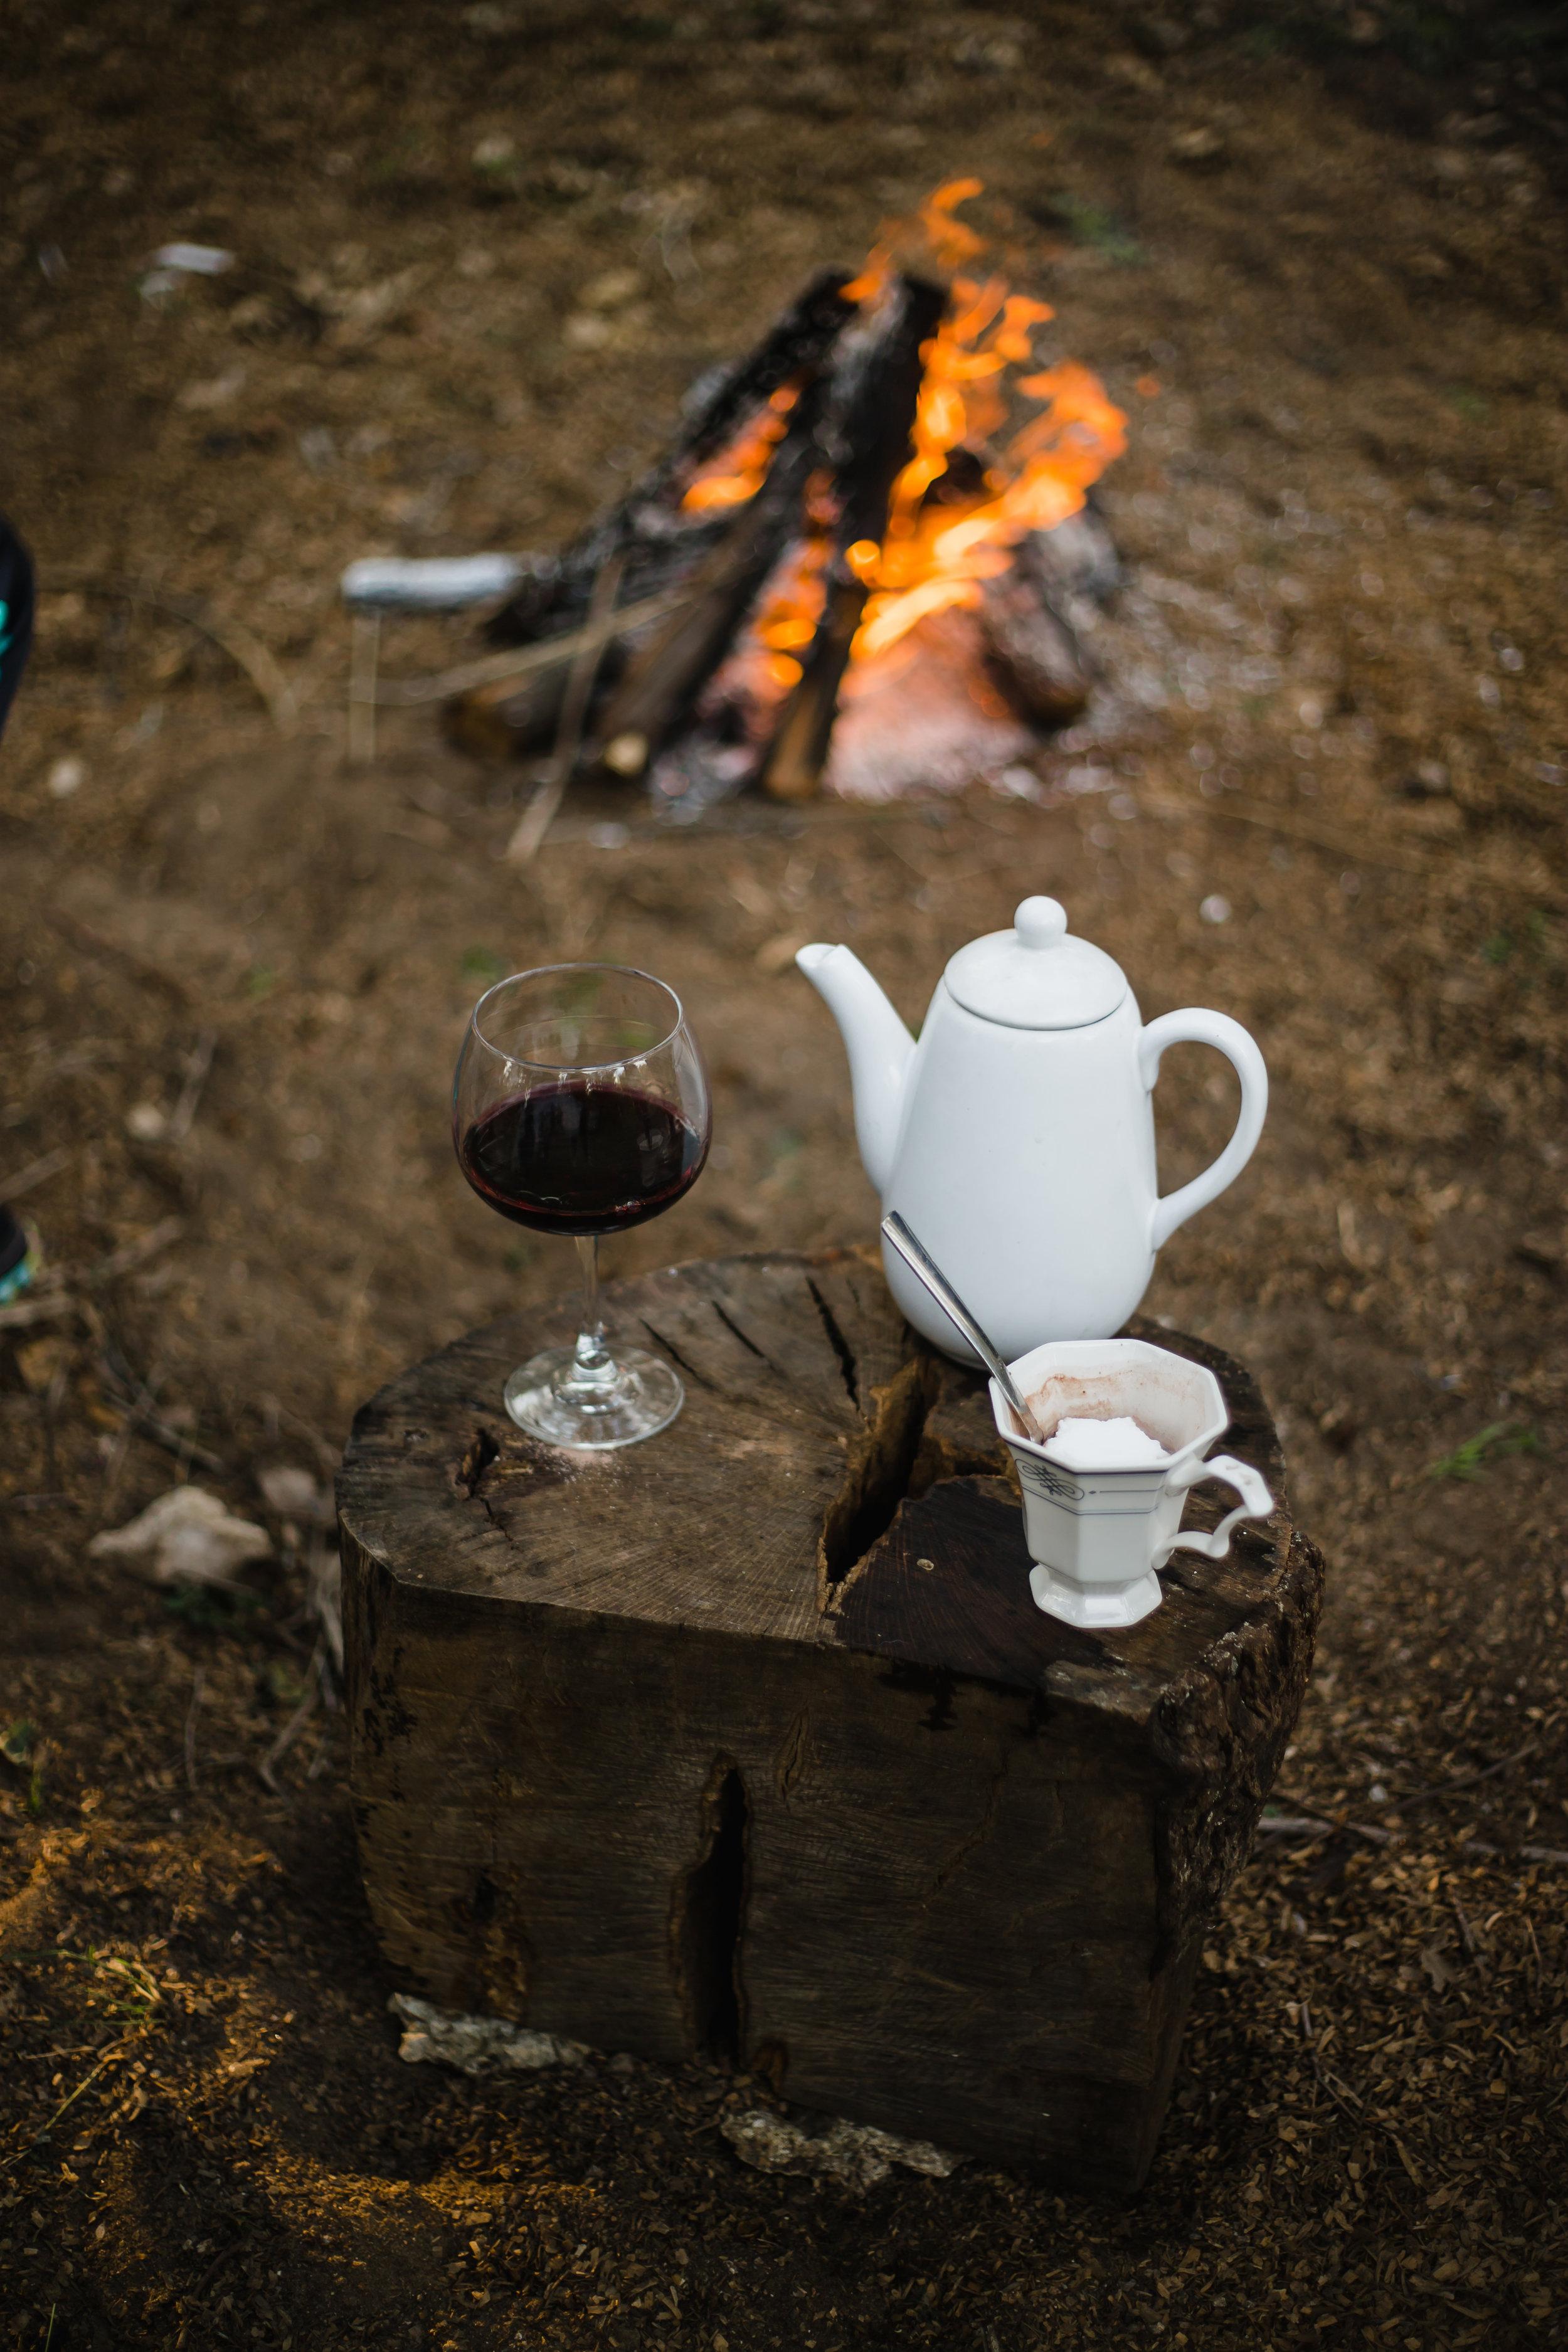 peppermint_marshmallows_bonfire-65.jpg